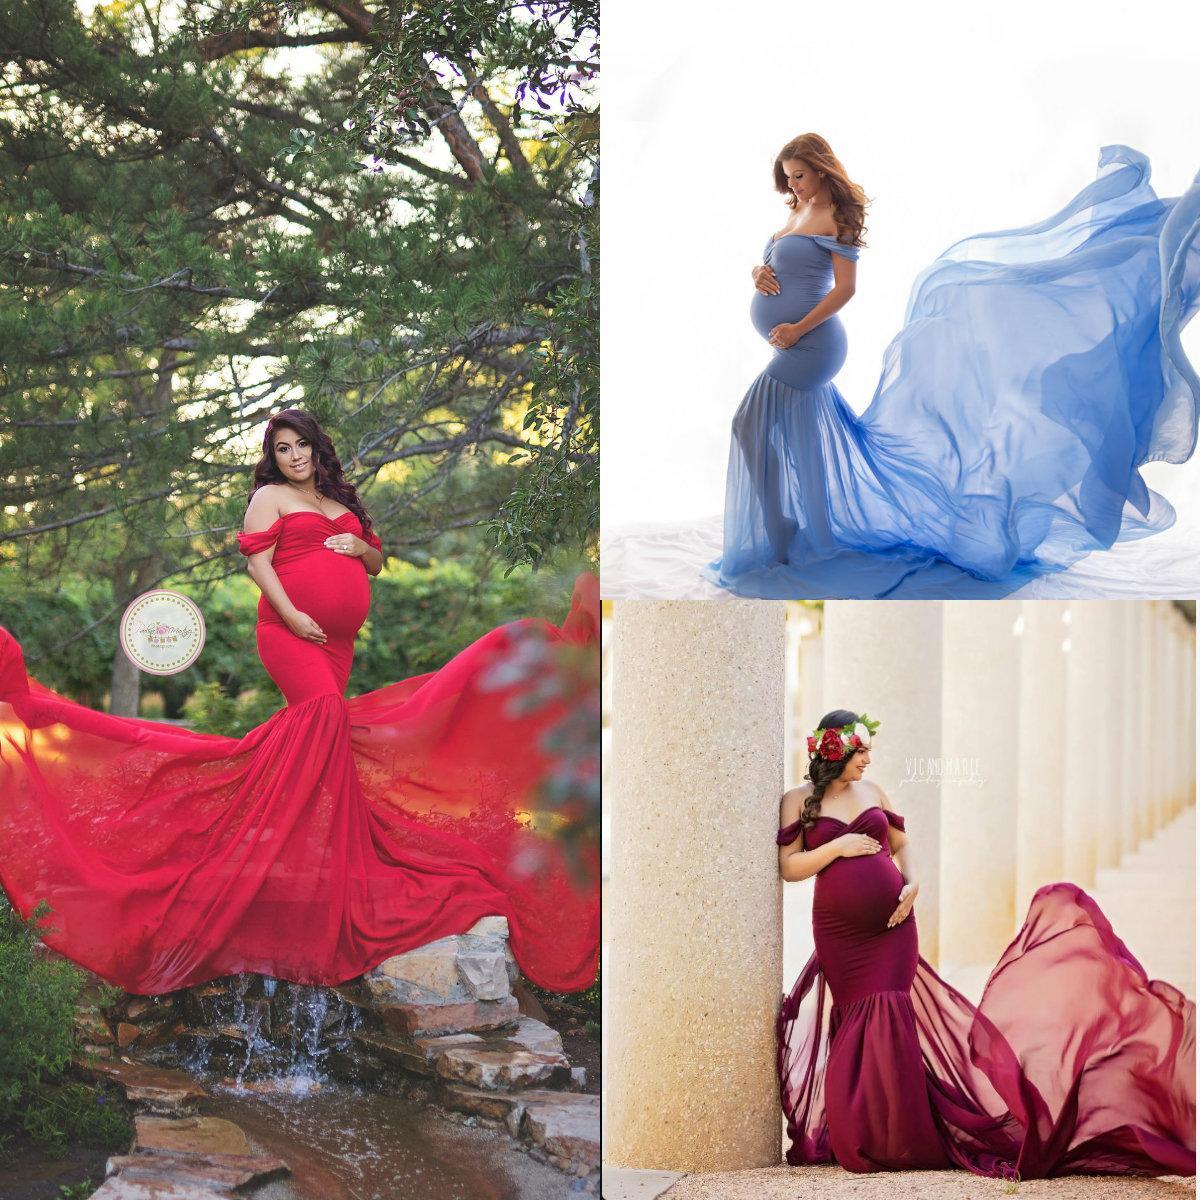 Red Cotton Chiffon Pregnant Women Bathrobe Sexy Kimono Party Sleepwear Women Bathgowns Off The Shoulder Nightgown Robe